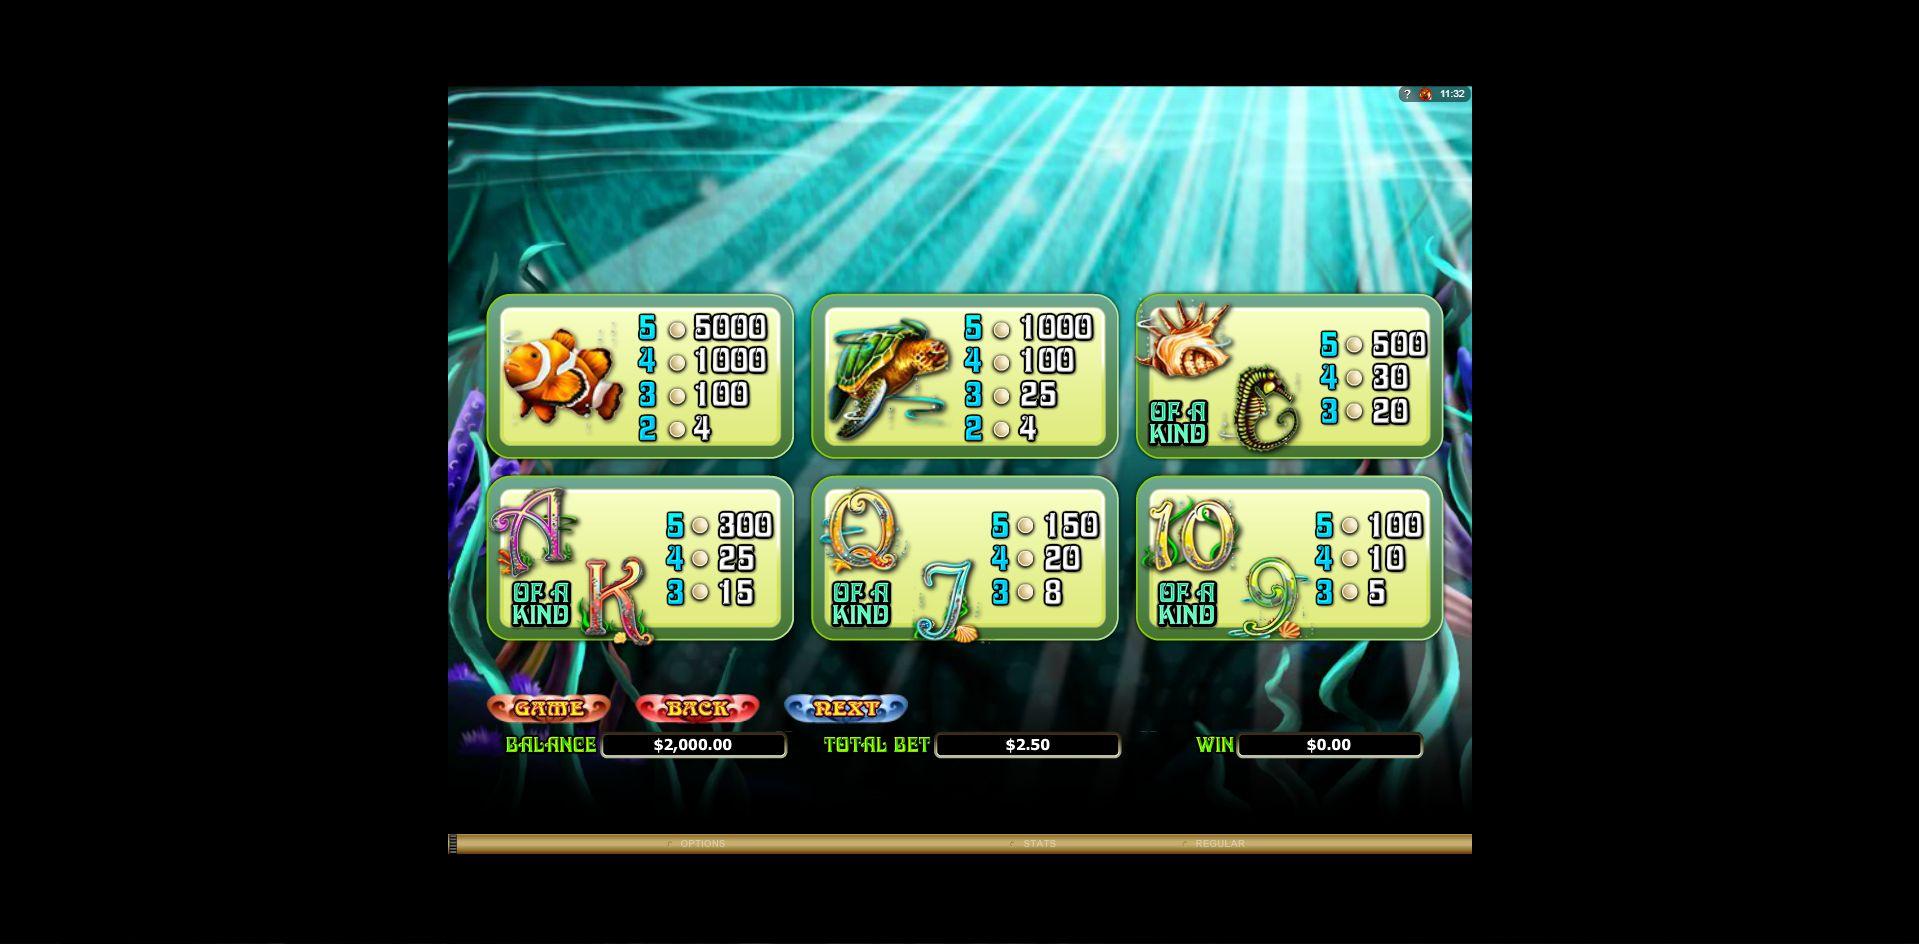 Kolikkopelit casino del rio download spiele